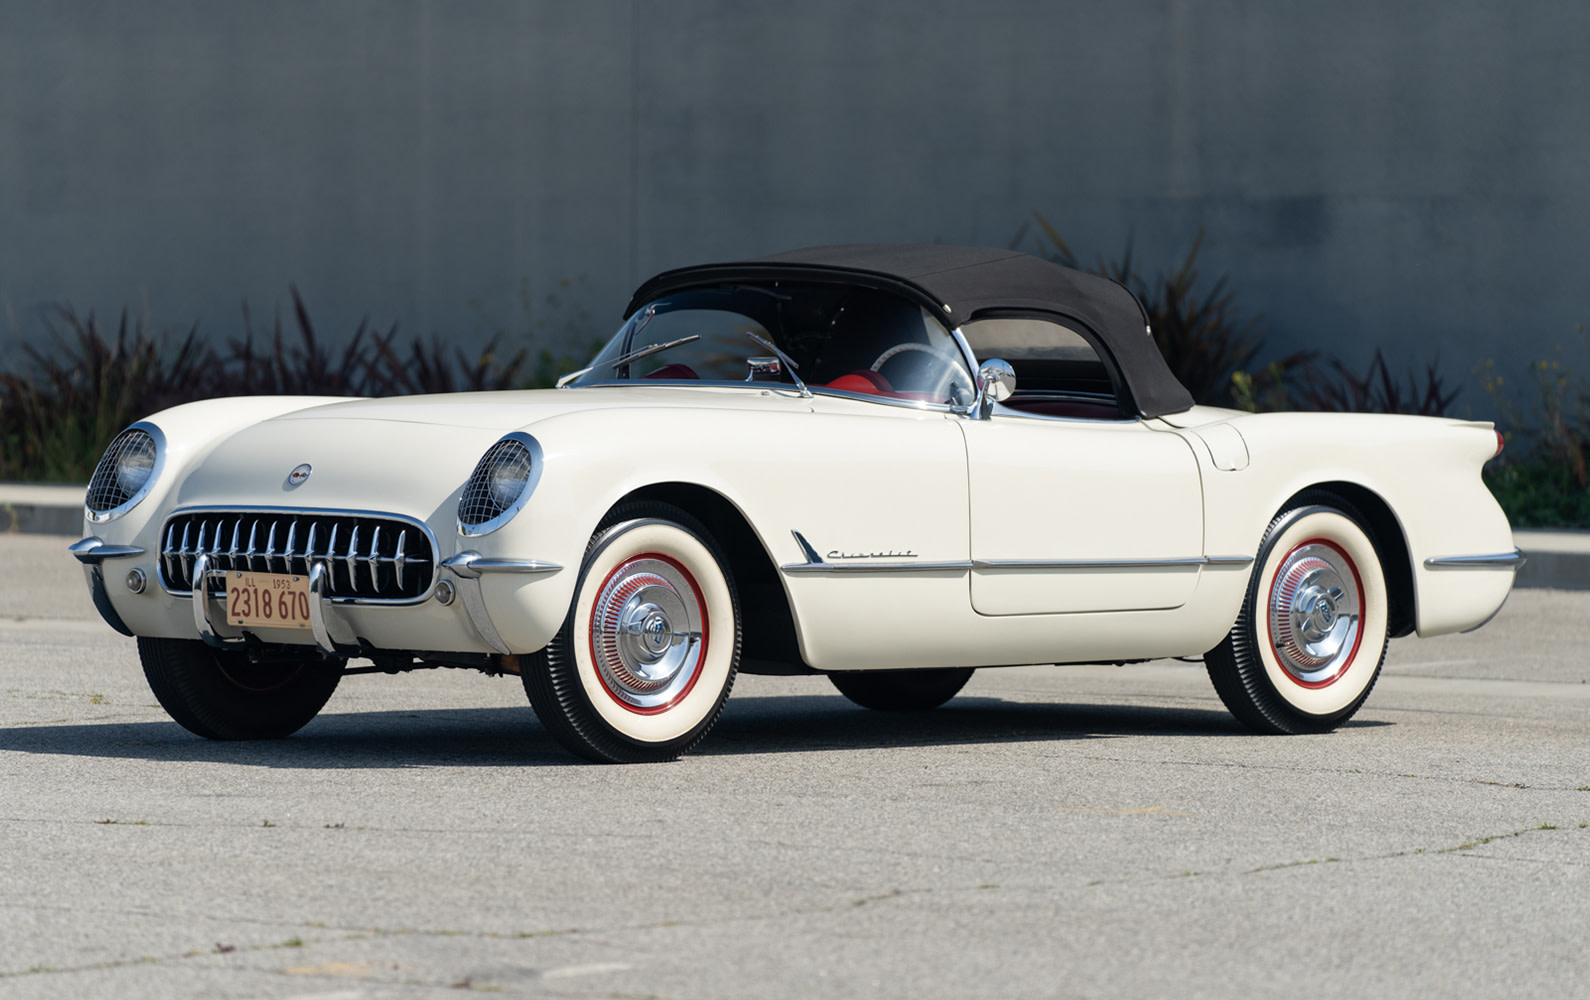 Prod/O21F - May 2021/1495_1953 Chevrolet Corvette/1953_Chevrolet_Corvette-1_JPEG_Press_f60ijz